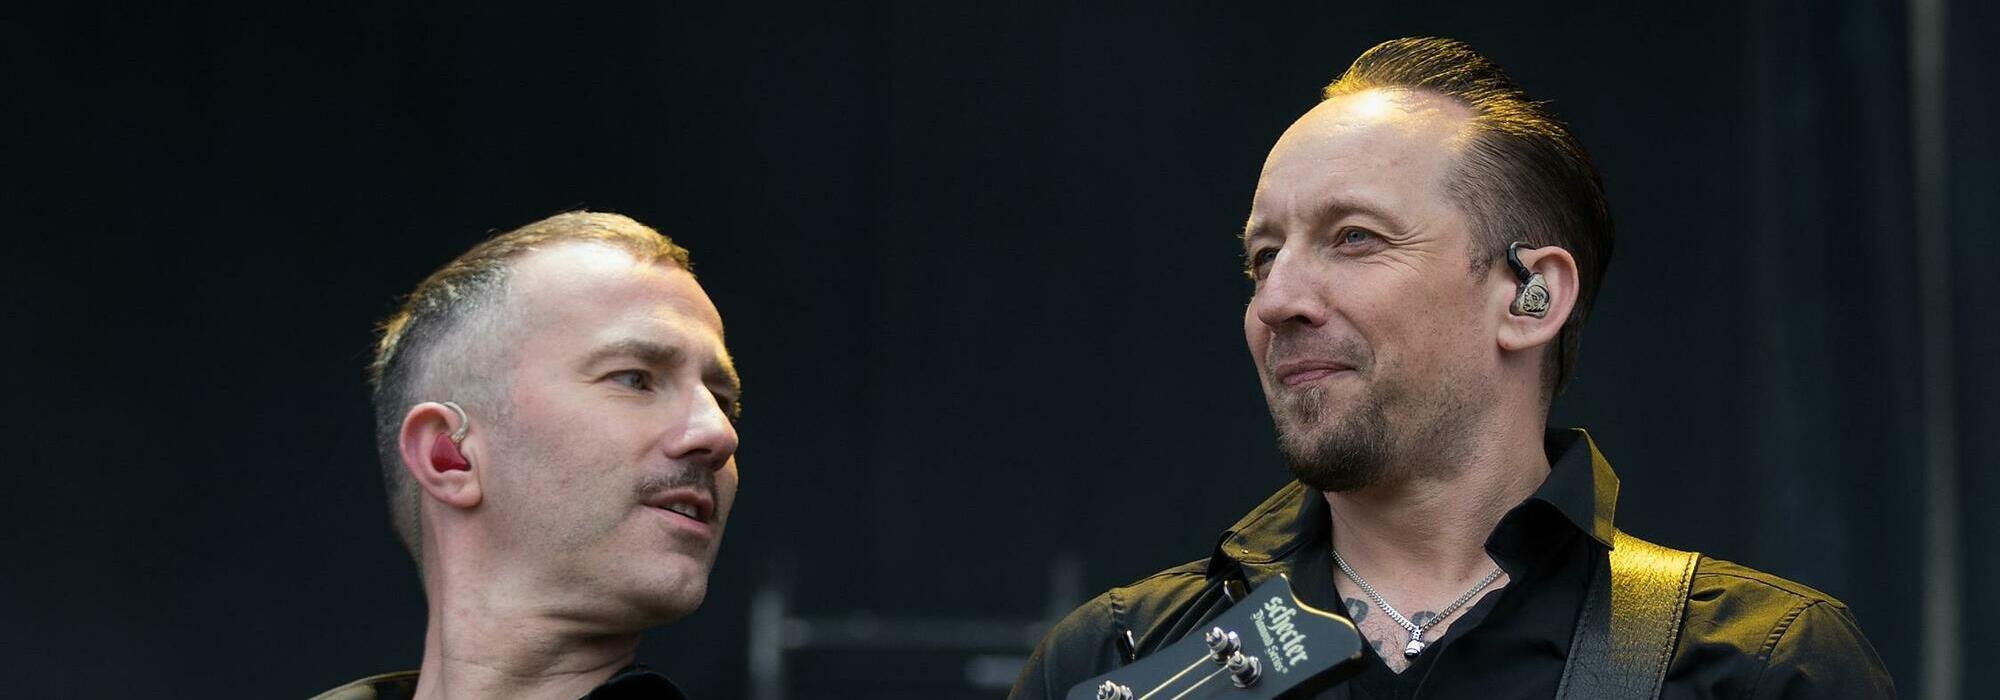 A Volbeat live event